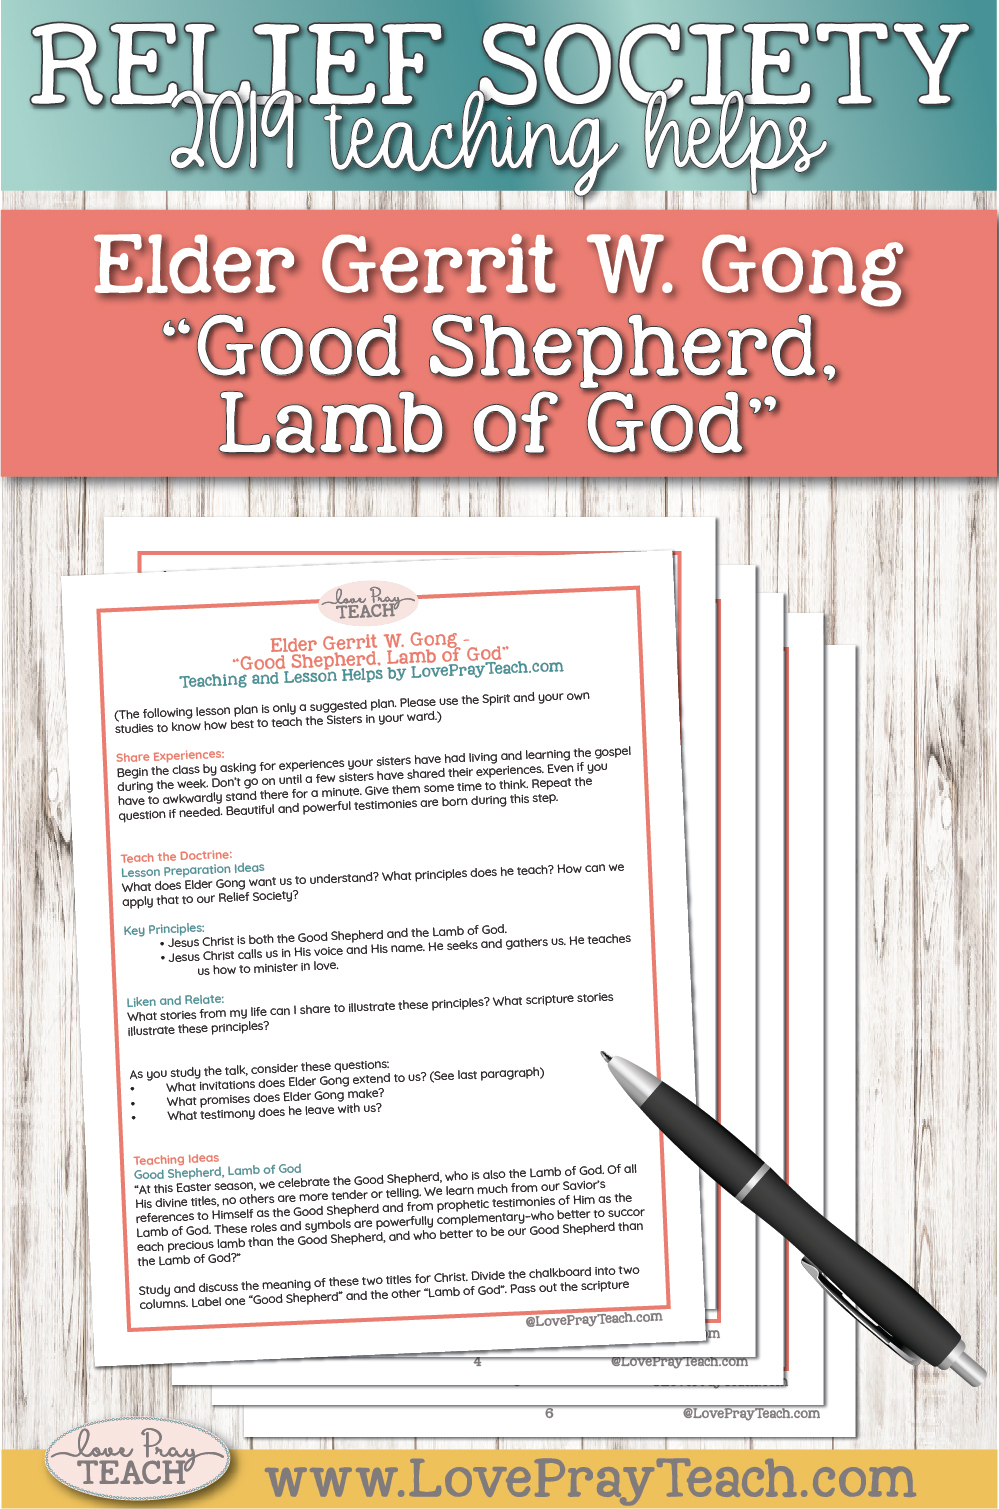 "April 2019 General Conference Lesson Helps for Elder Gerrit W. Gong ""Good Shepherd, Lamb of God"" Printable Teaching Packet www.LovePrayTeach.com"